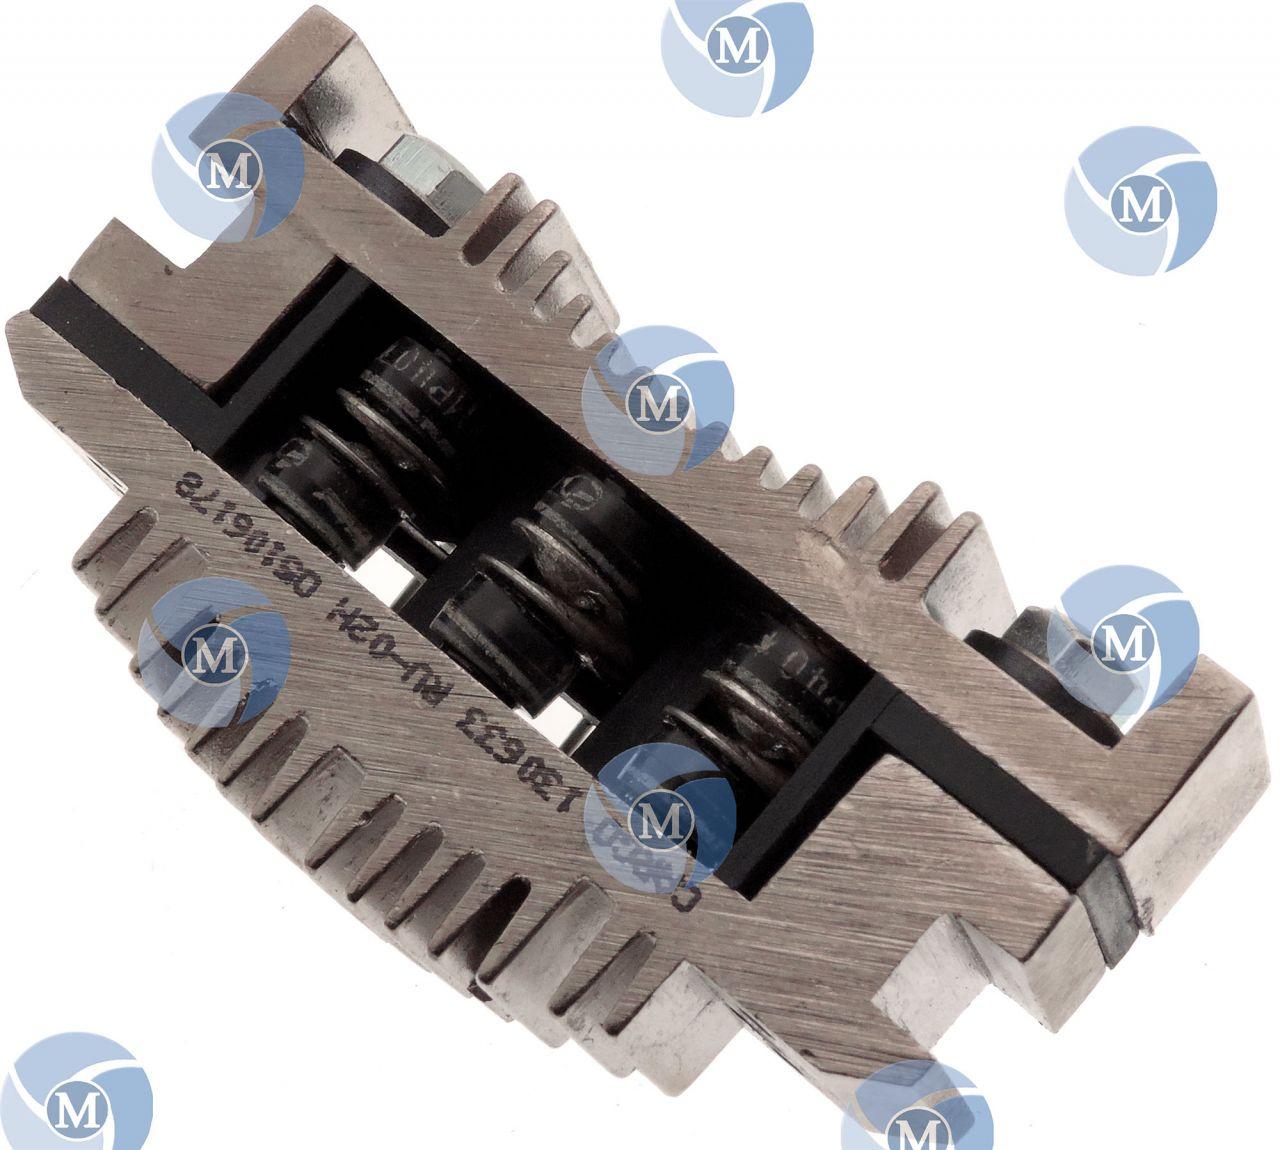 pont de diodes pour alternateur magneti marelli 63320022. Black Bedroom Furniture Sets. Home Design Ideas